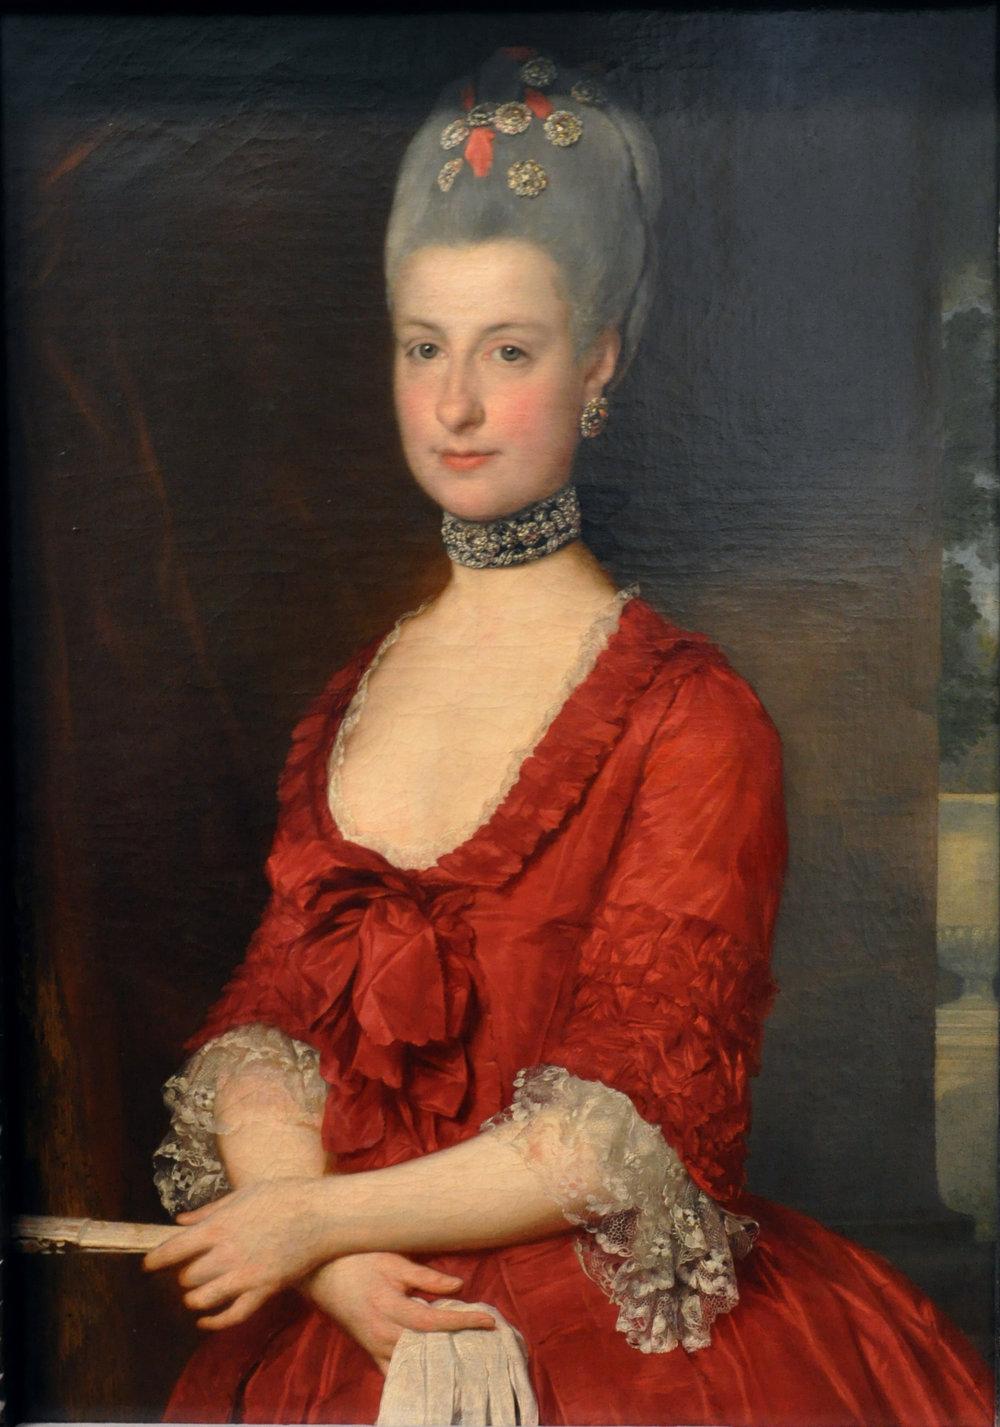 Archduchess Maria Christina, Duchess of Teschen, by Marcello Bacciarelli, 1766